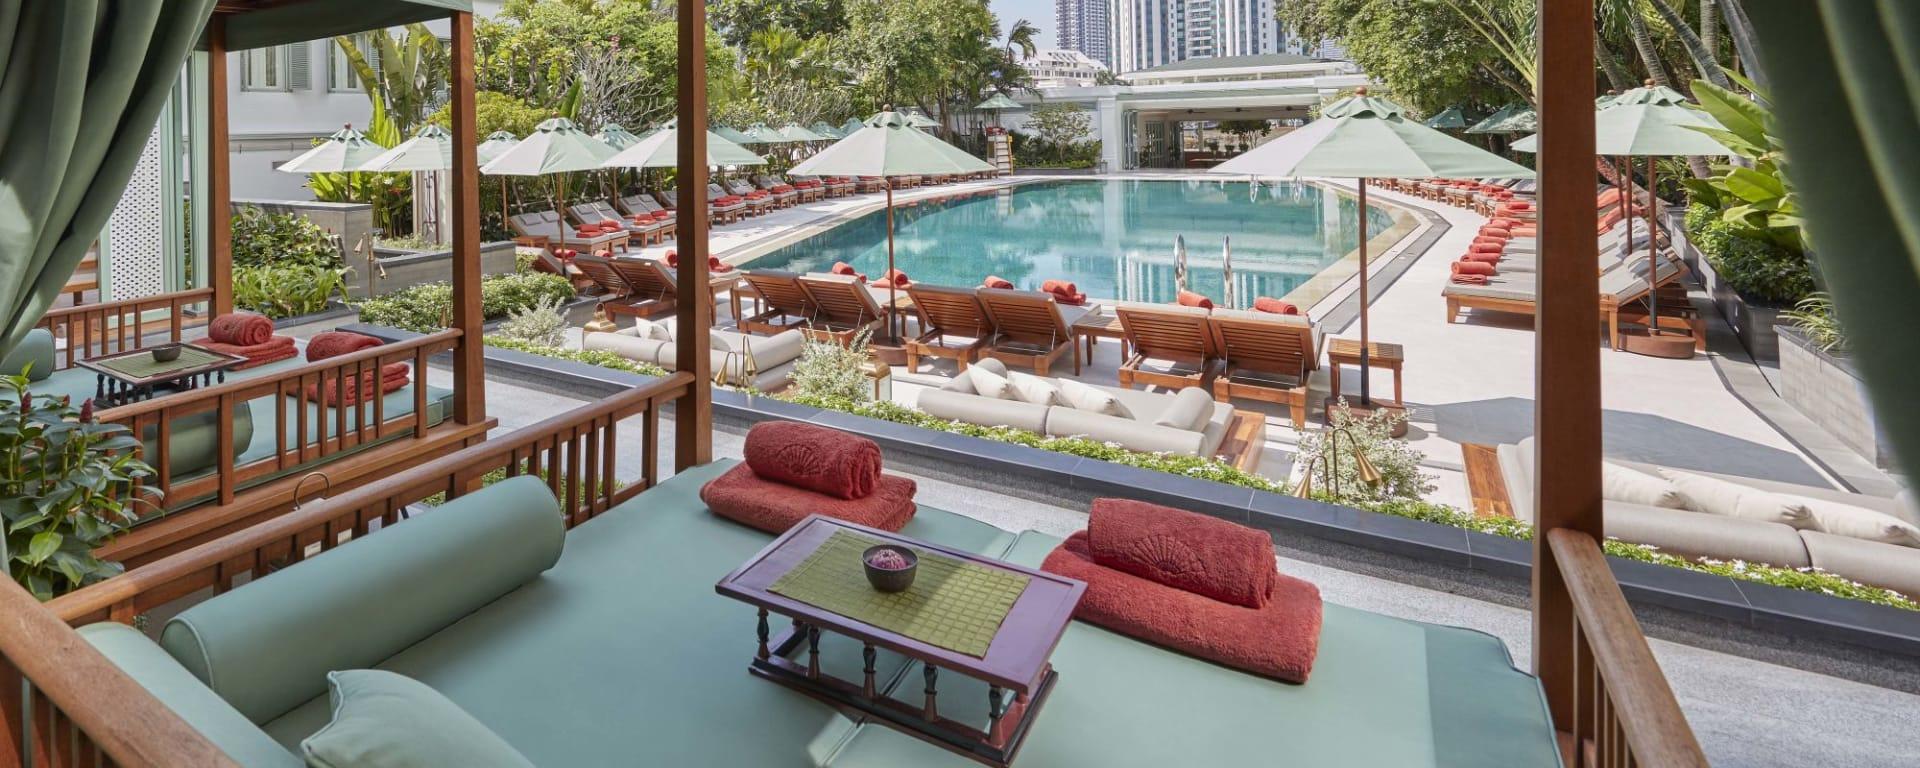 Mandarin Oriental in Bangkok: Cabana and pool